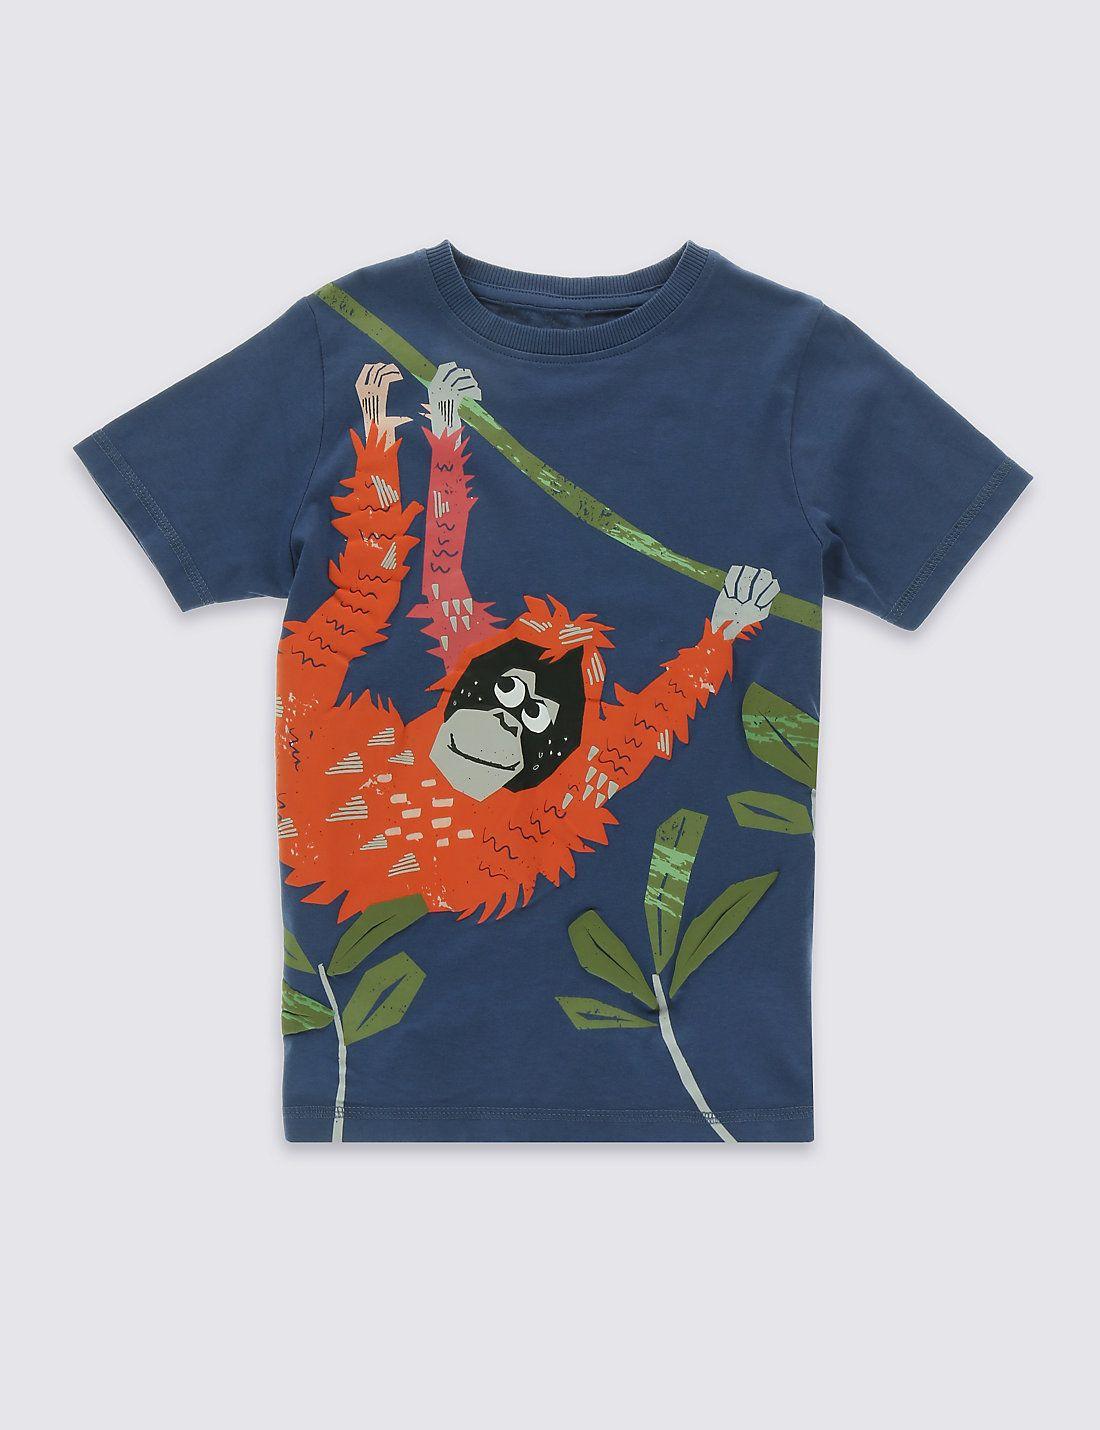 Pure Cotton Orangutan Print TShirt (17 Years) Download